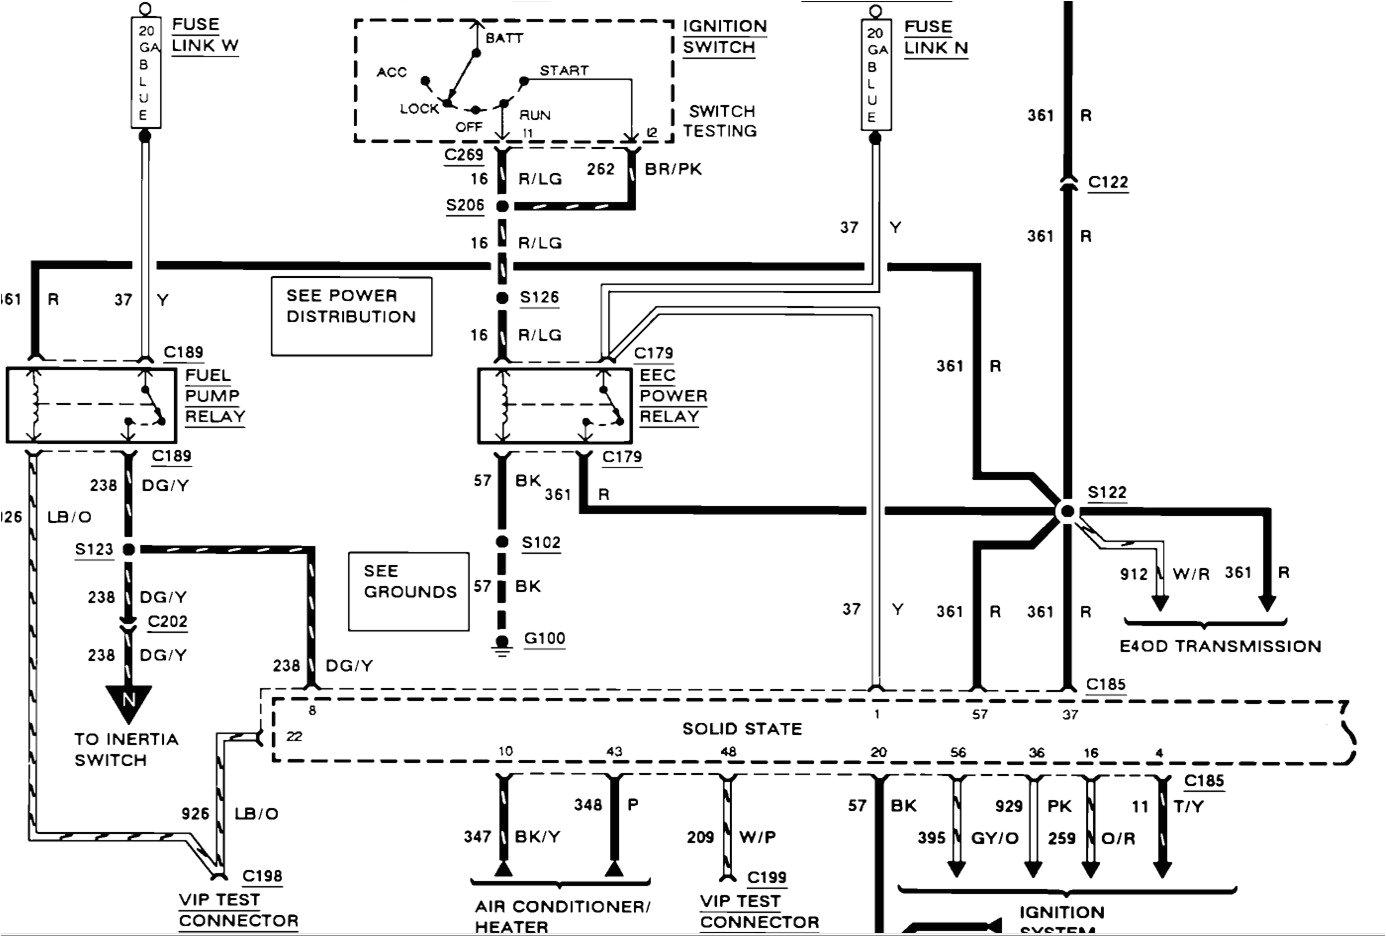 1991 f350 wiring diagram wiring diagrams dimensions 1991 ford f350 wiring diagram pdf 1991 f350 wiring diagram